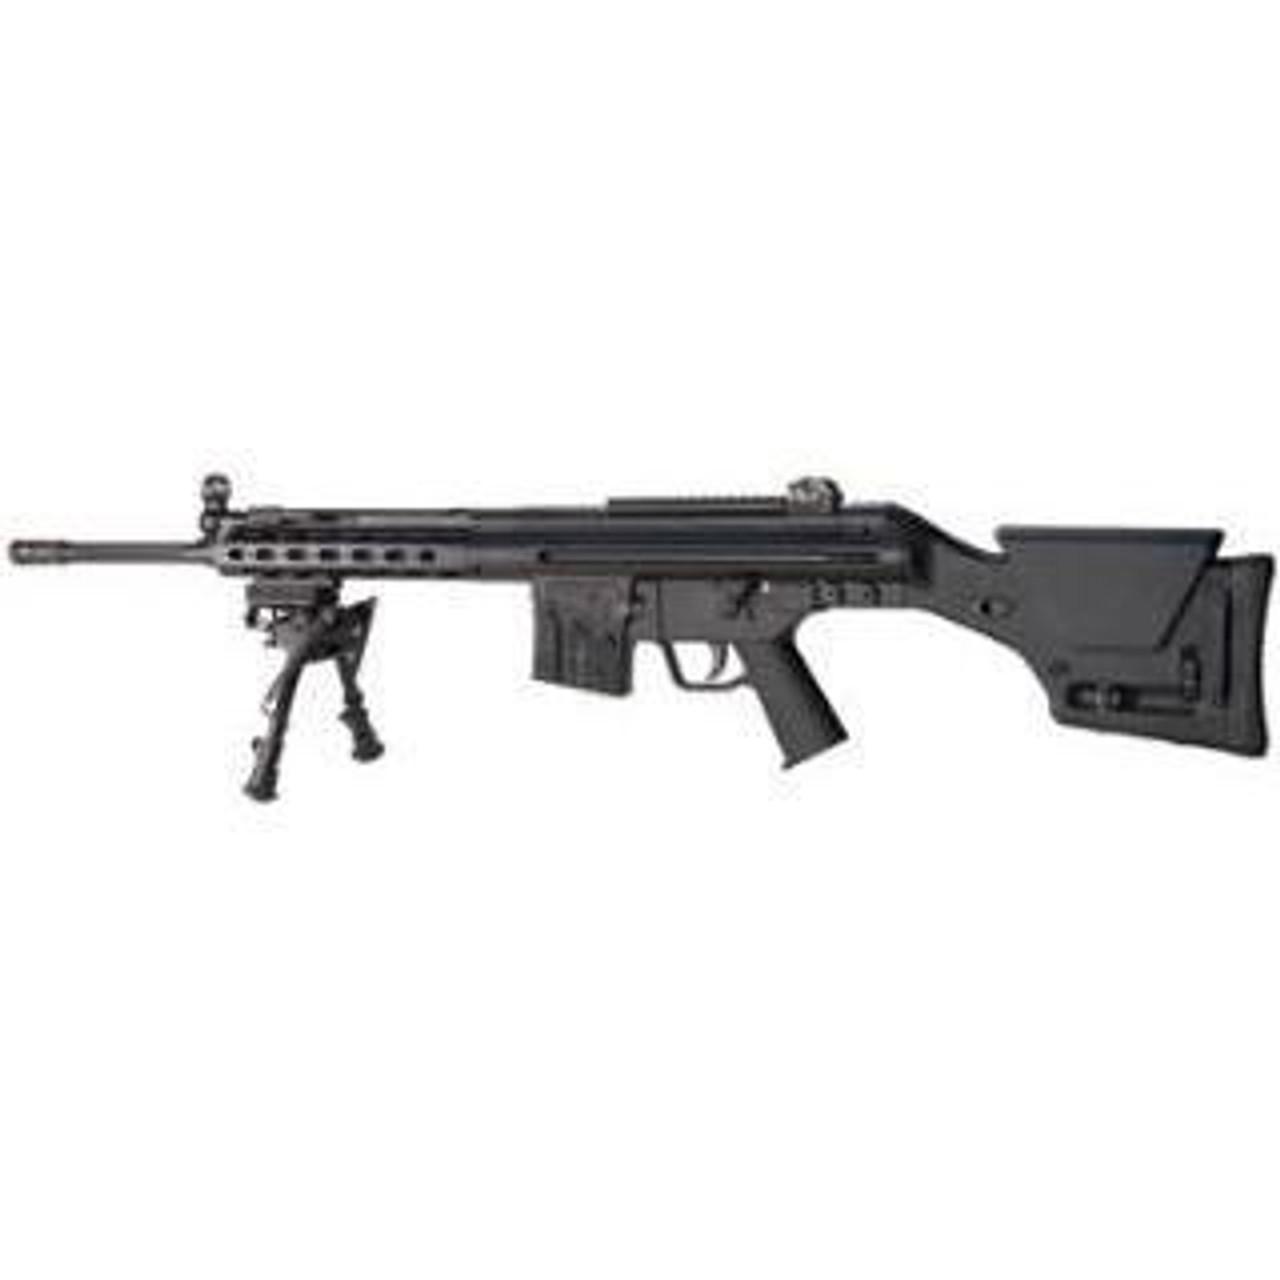 PTR-91 MSG CALIFORNIA LEGAL .308